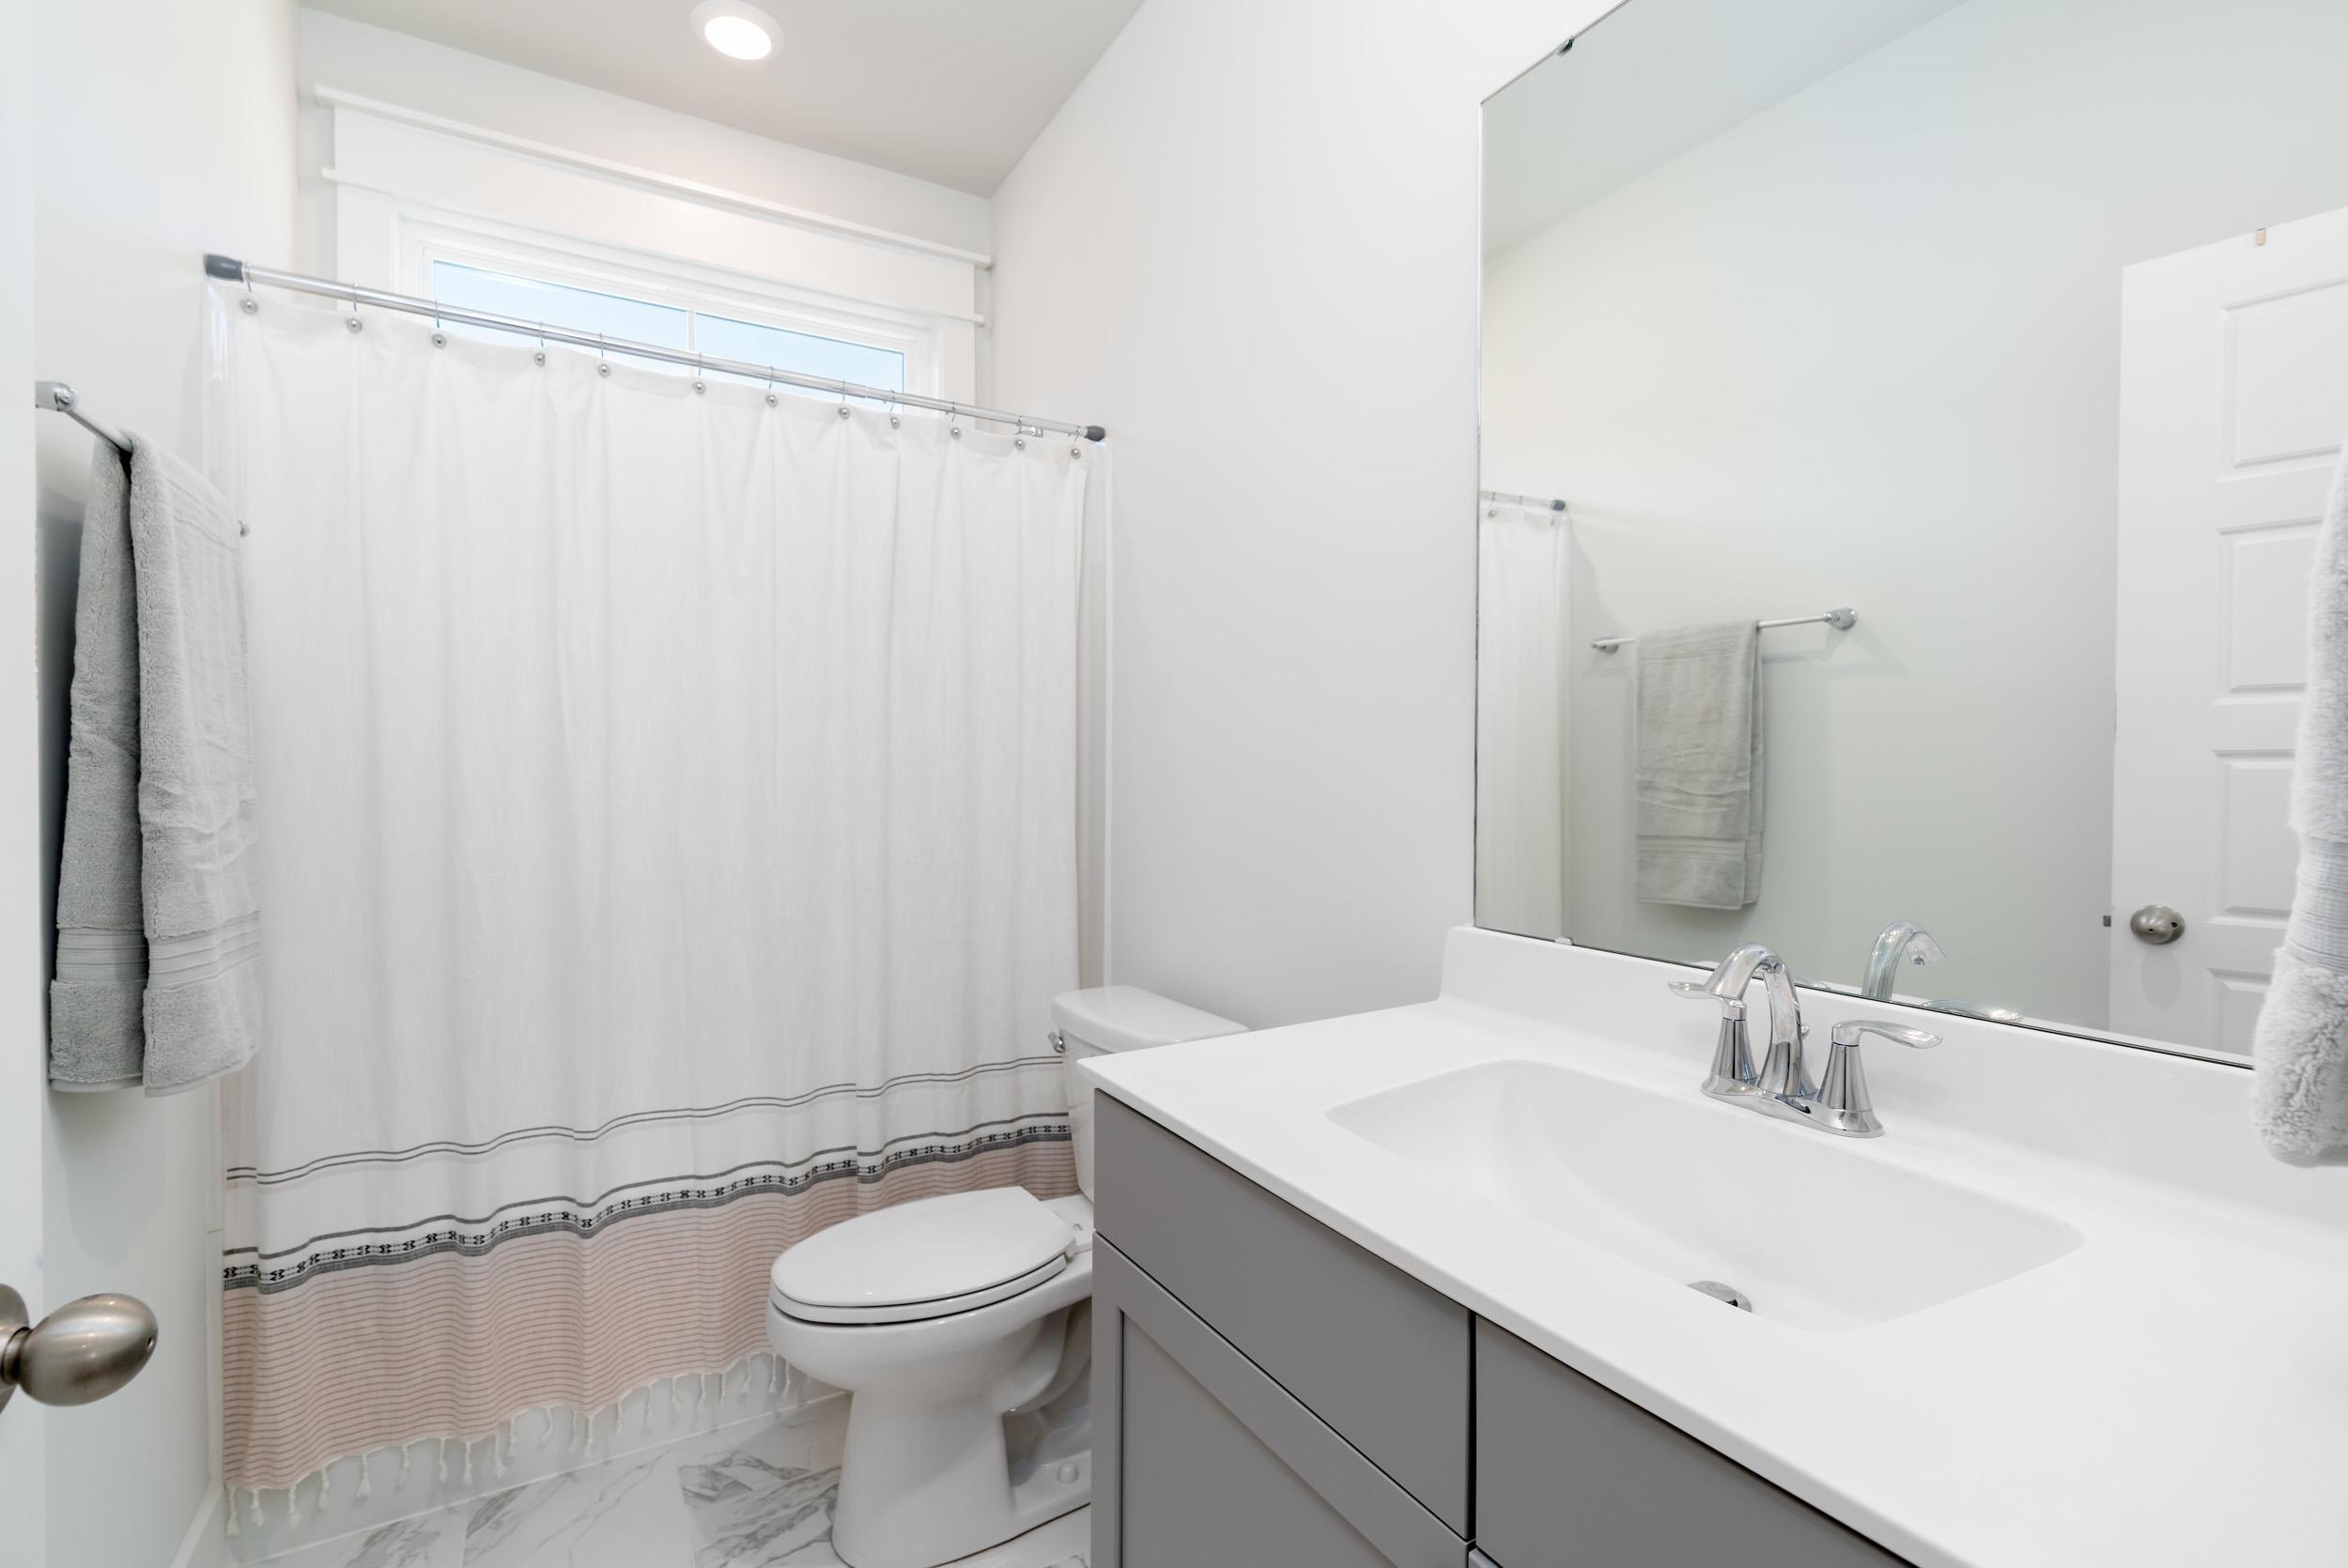 Hamlin Oaks Homes For Sale - 2921 Tranquility, Mount Pleasant, SC - 26